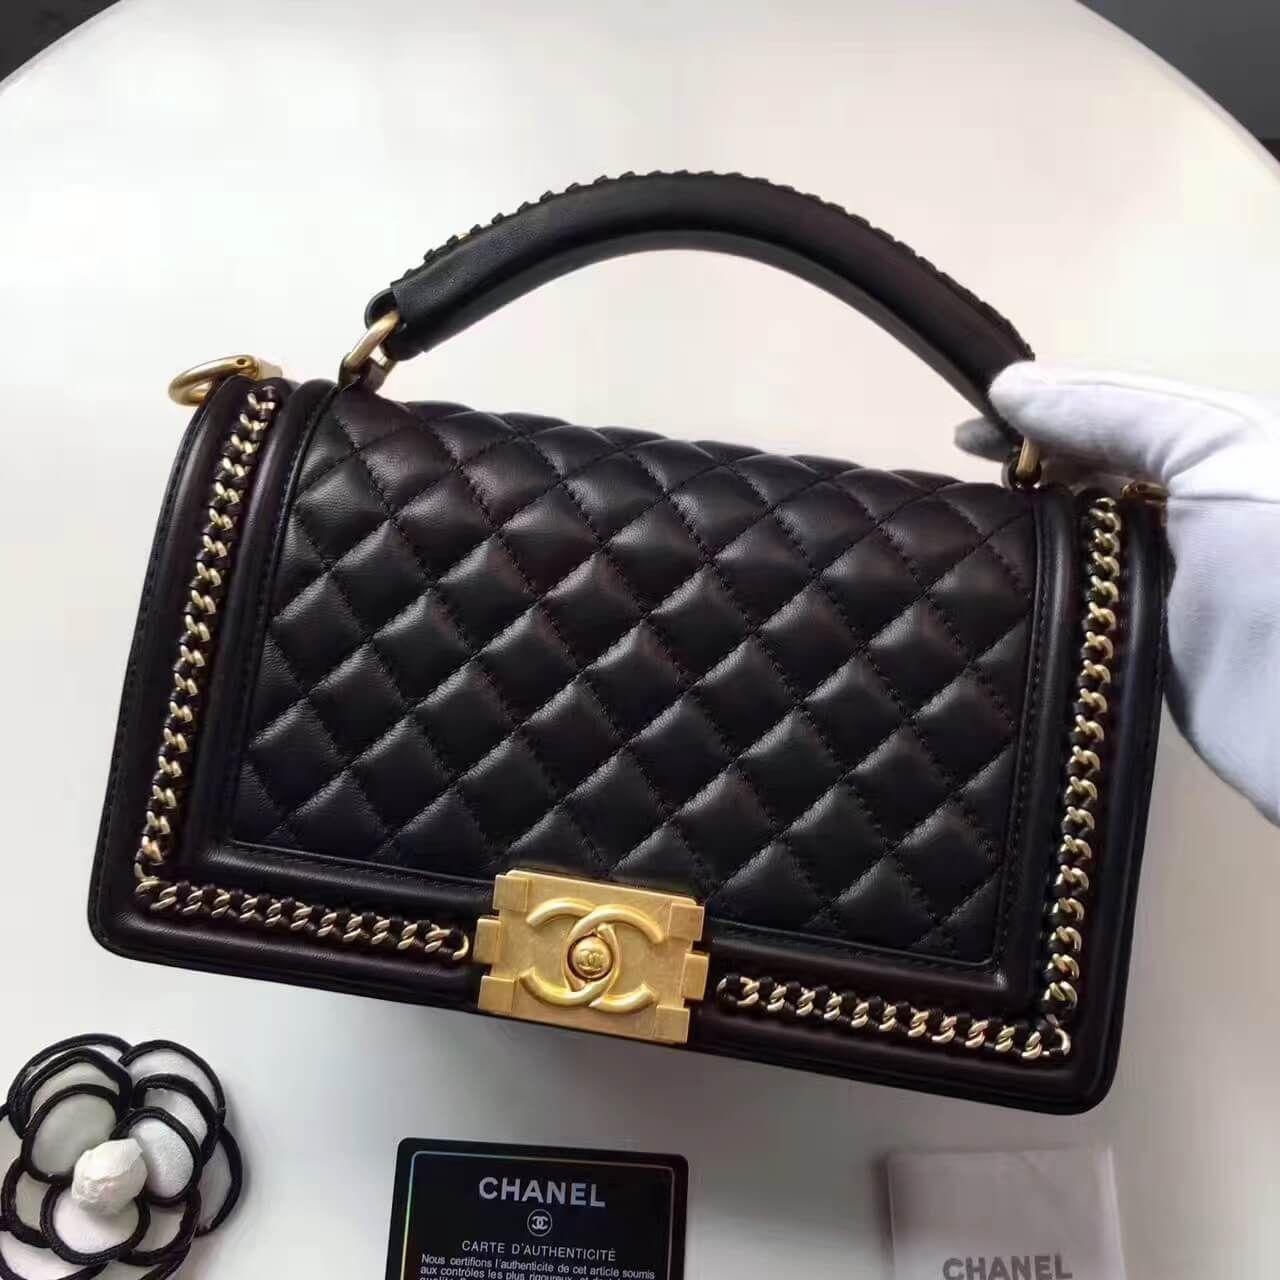 Chanel Lambskin Medium Boy Chanel Handbag Chanel